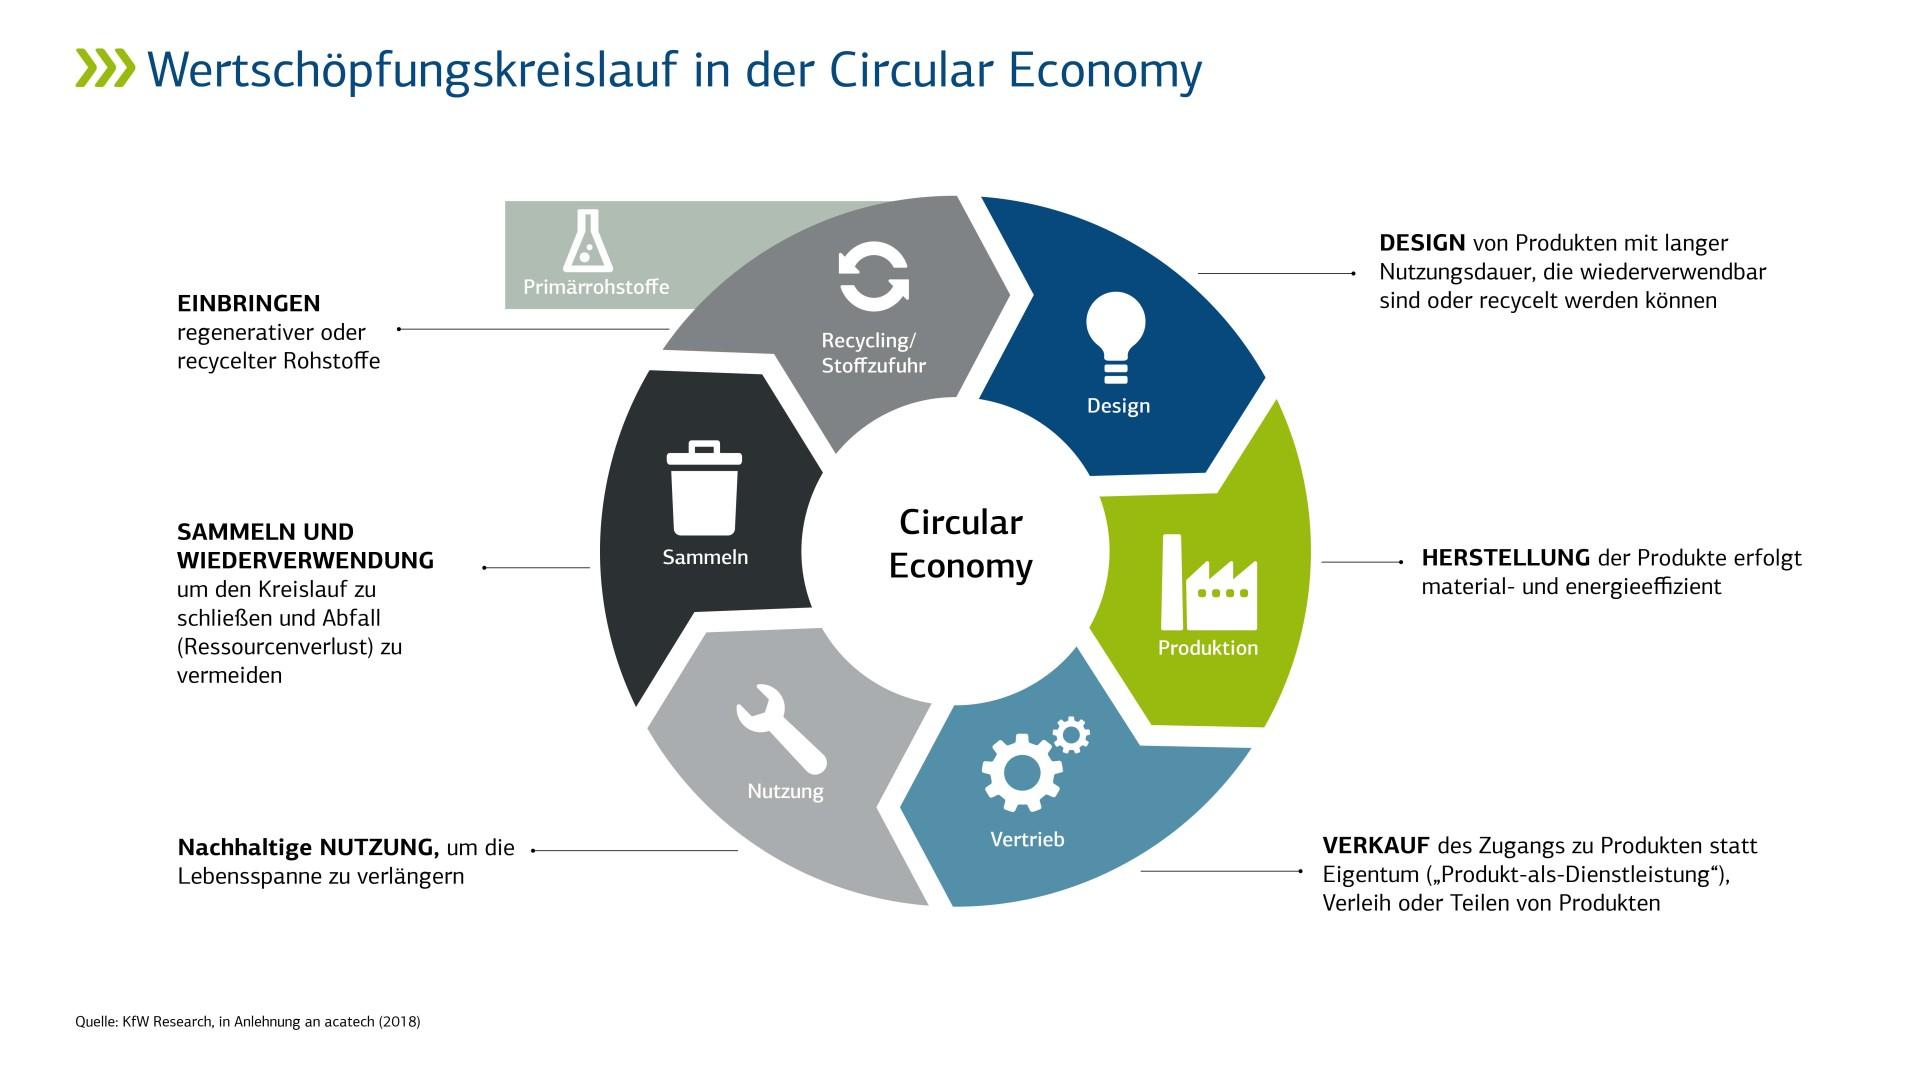 https://www.kfw.de/stories/kfw/bilder/umwelt/klimawandel/kreislaufwirtschaft-fokus/kreislaufwirtschaft-infografik-de_rs_picture_large.jpg